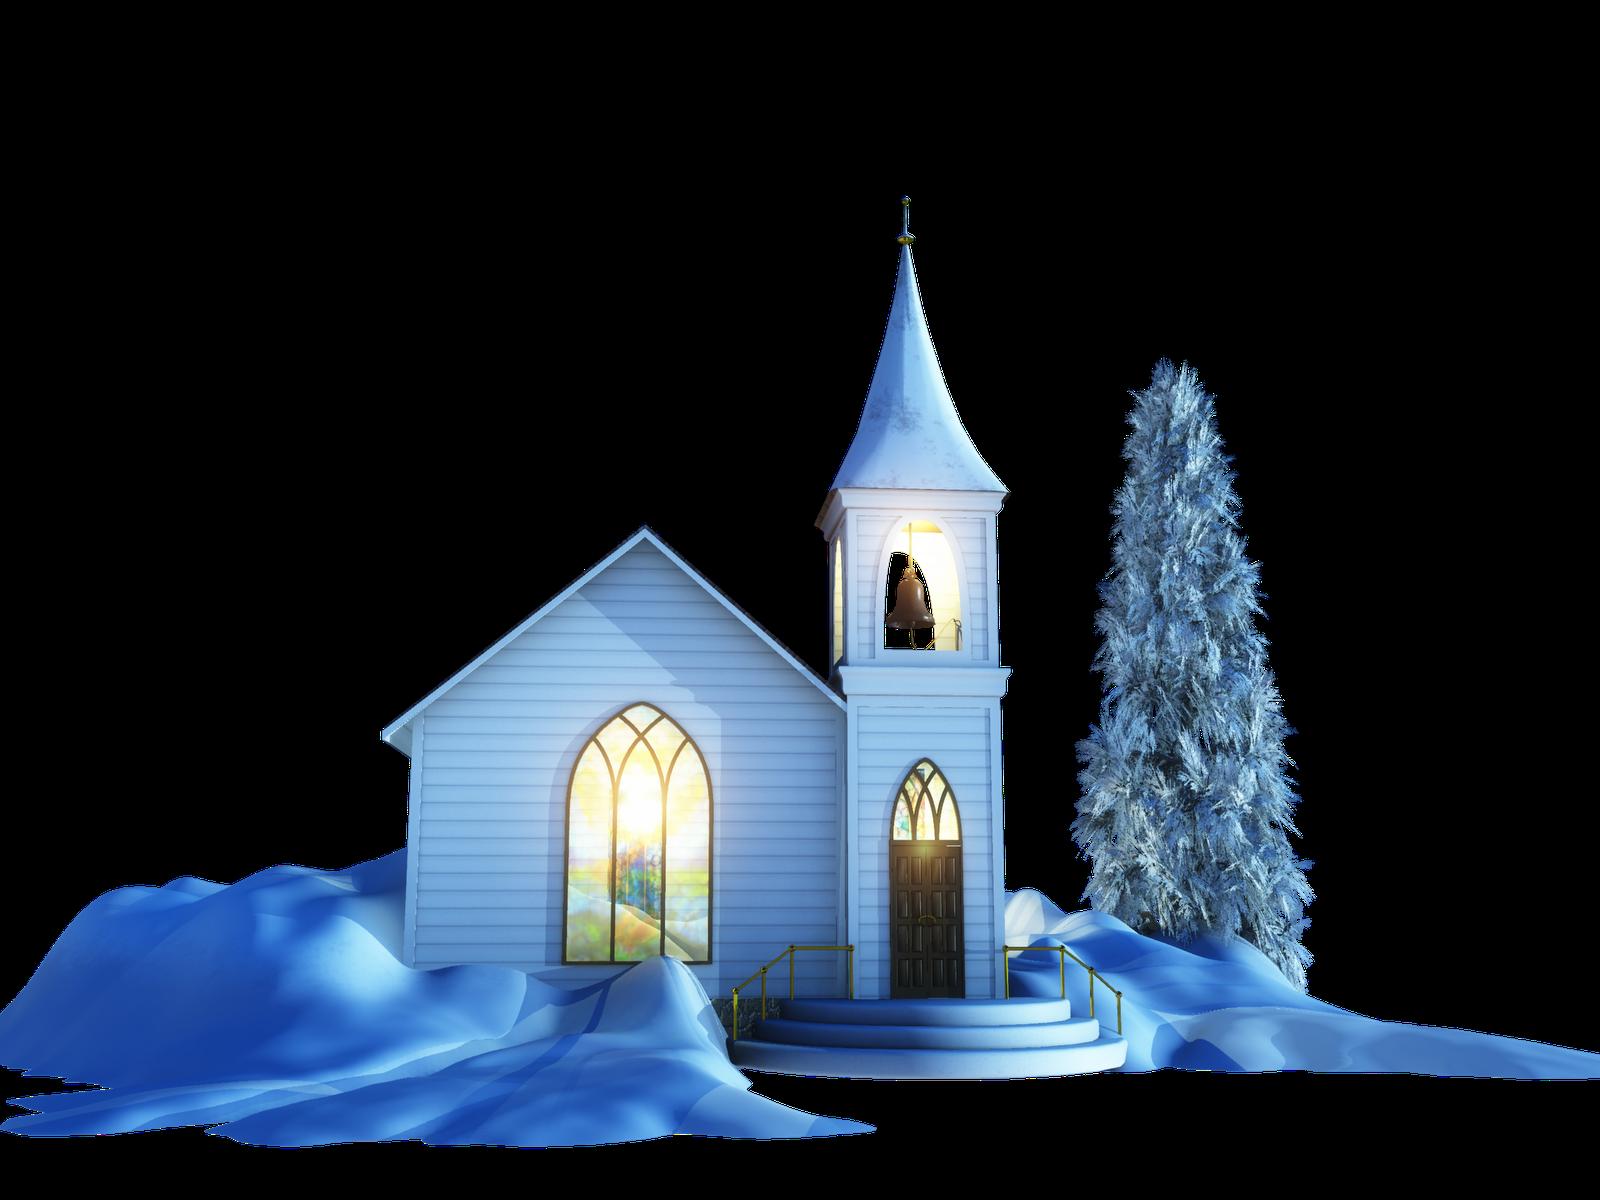 Winter Church Png Scenes New Year & Free Winter Church Scenes New.